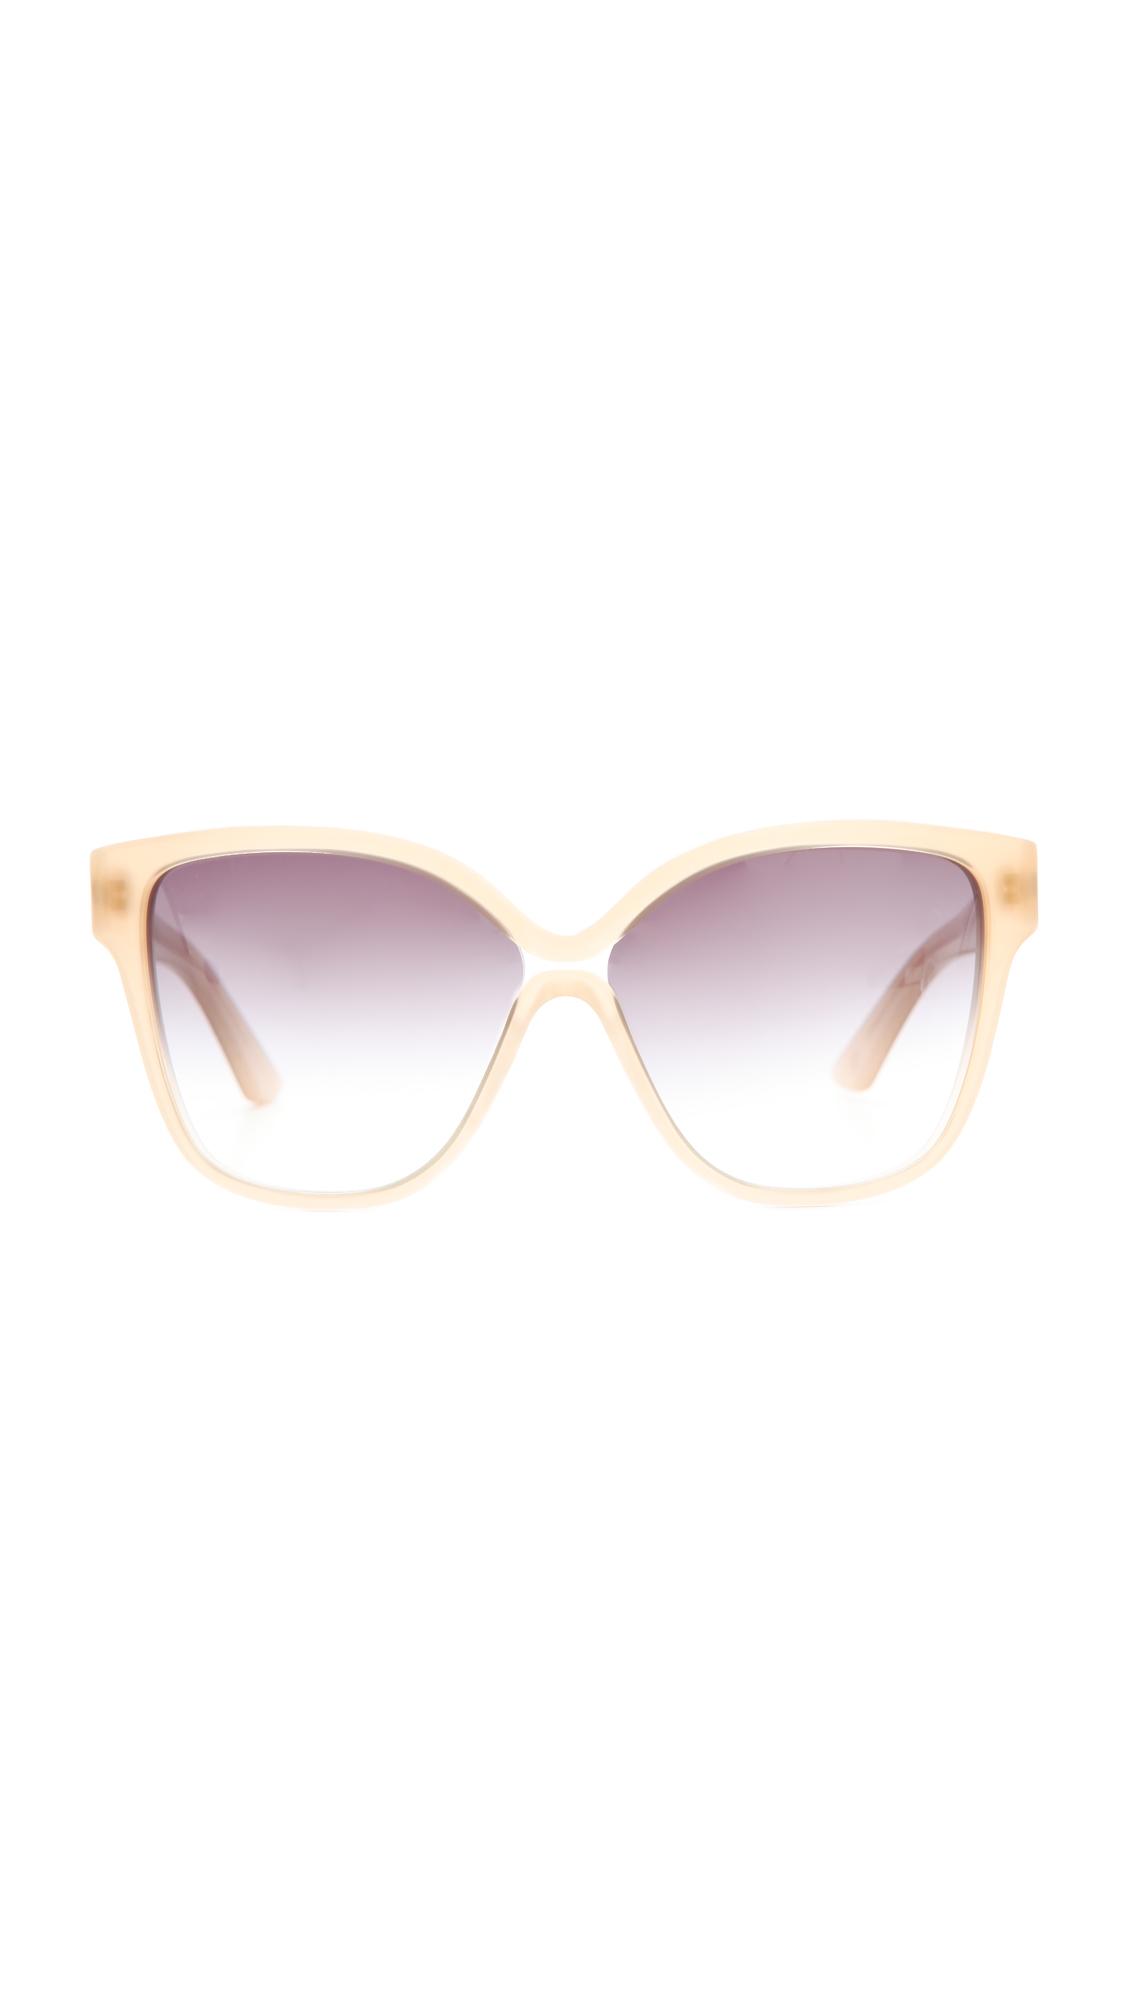 d93c5547547 DITA Paradis Sunglasses